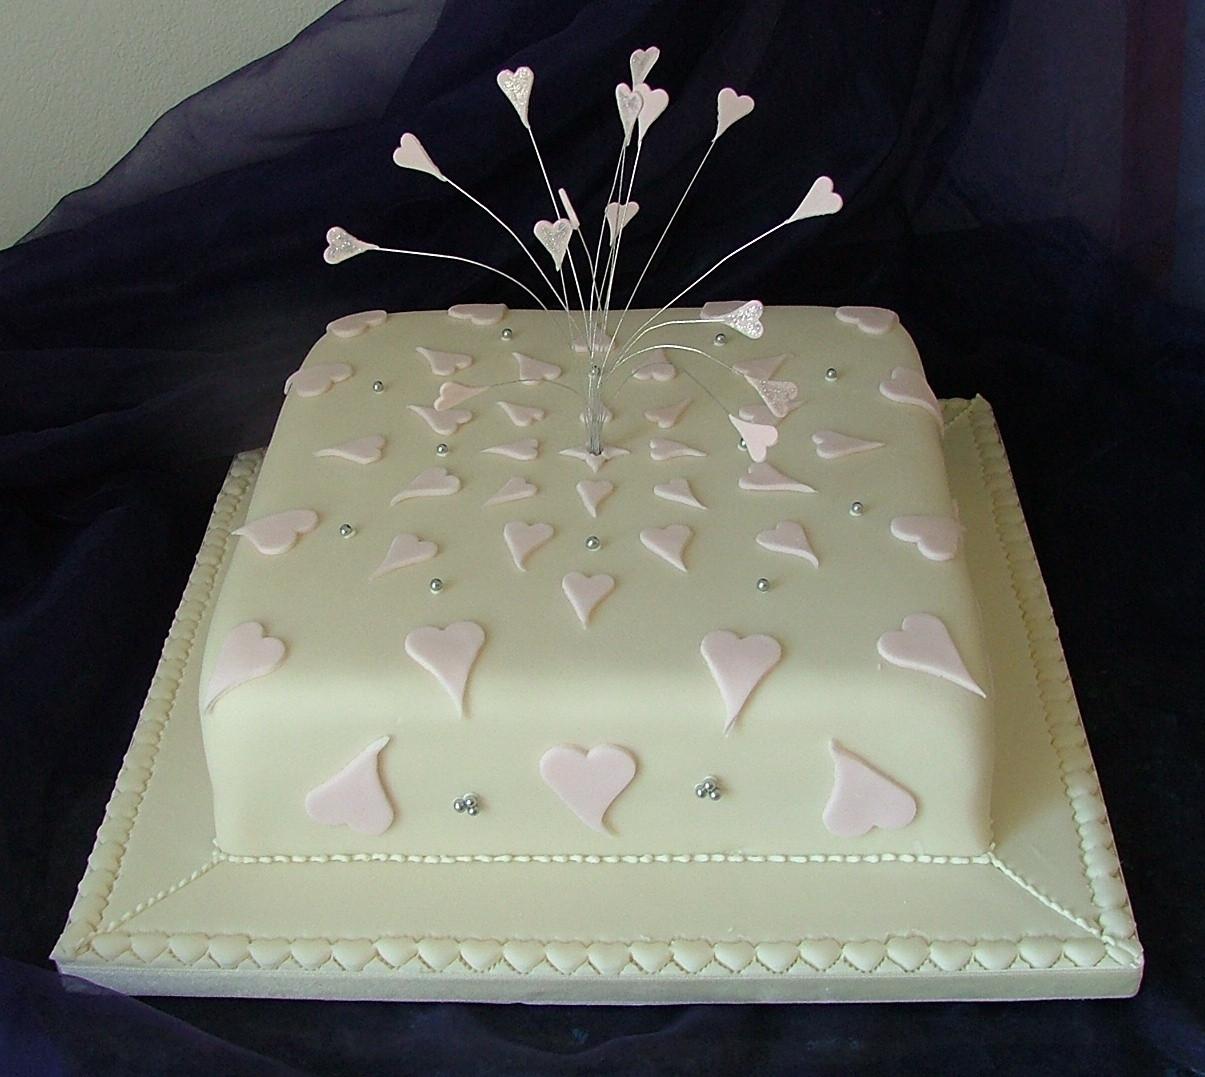 Simple One Tier Wedding Cakes  Simple one tier wedding cakes idea in 2017